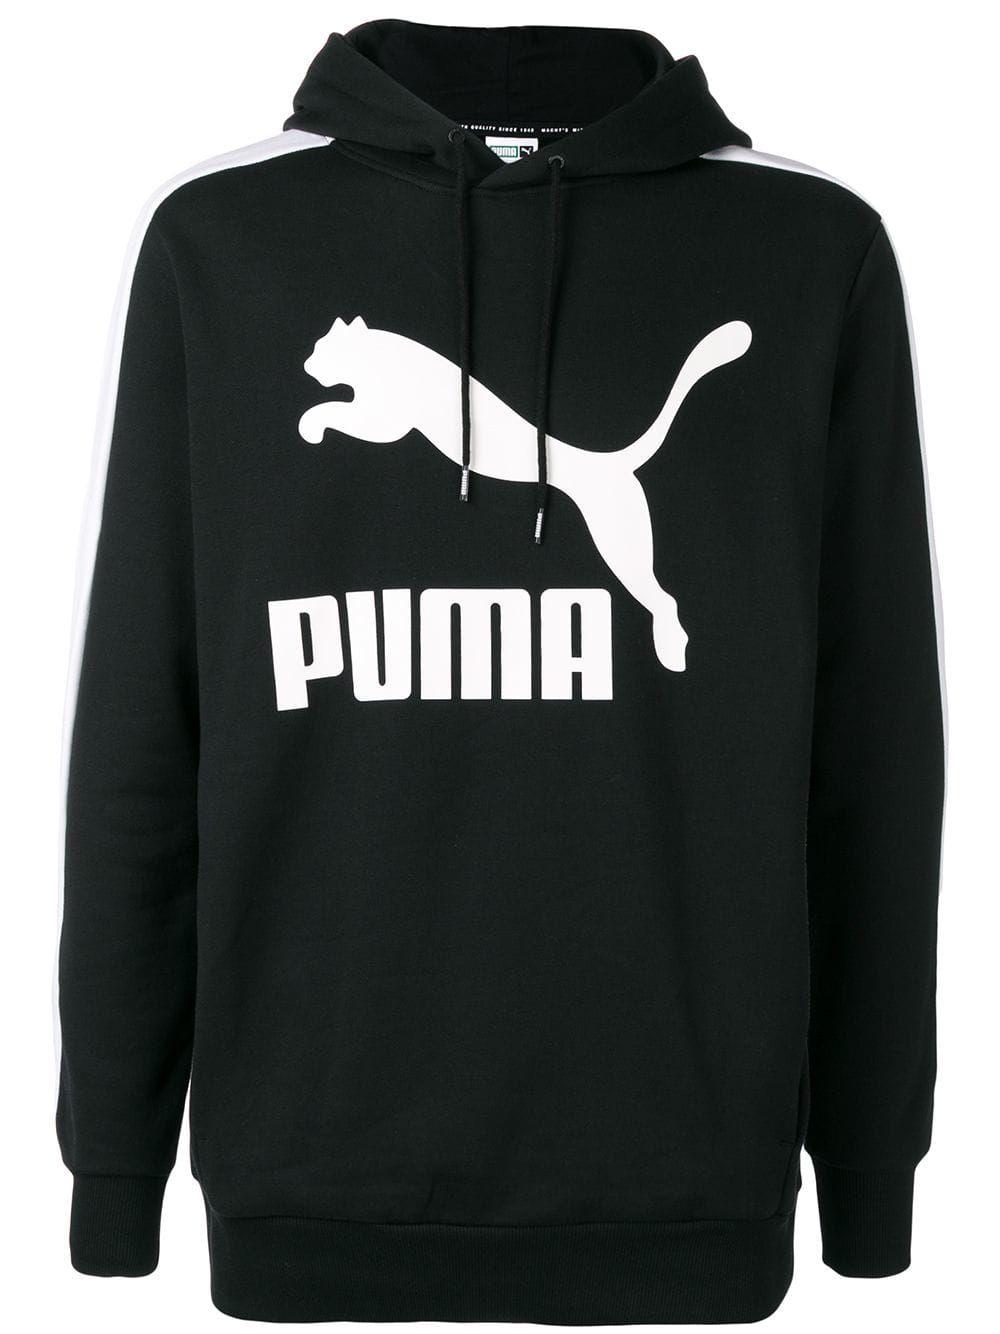 e58910feee PUMA PUMA LOGO PRINT HOODIE - BLACK. #puma #cloth | Puma | Hoodies ...